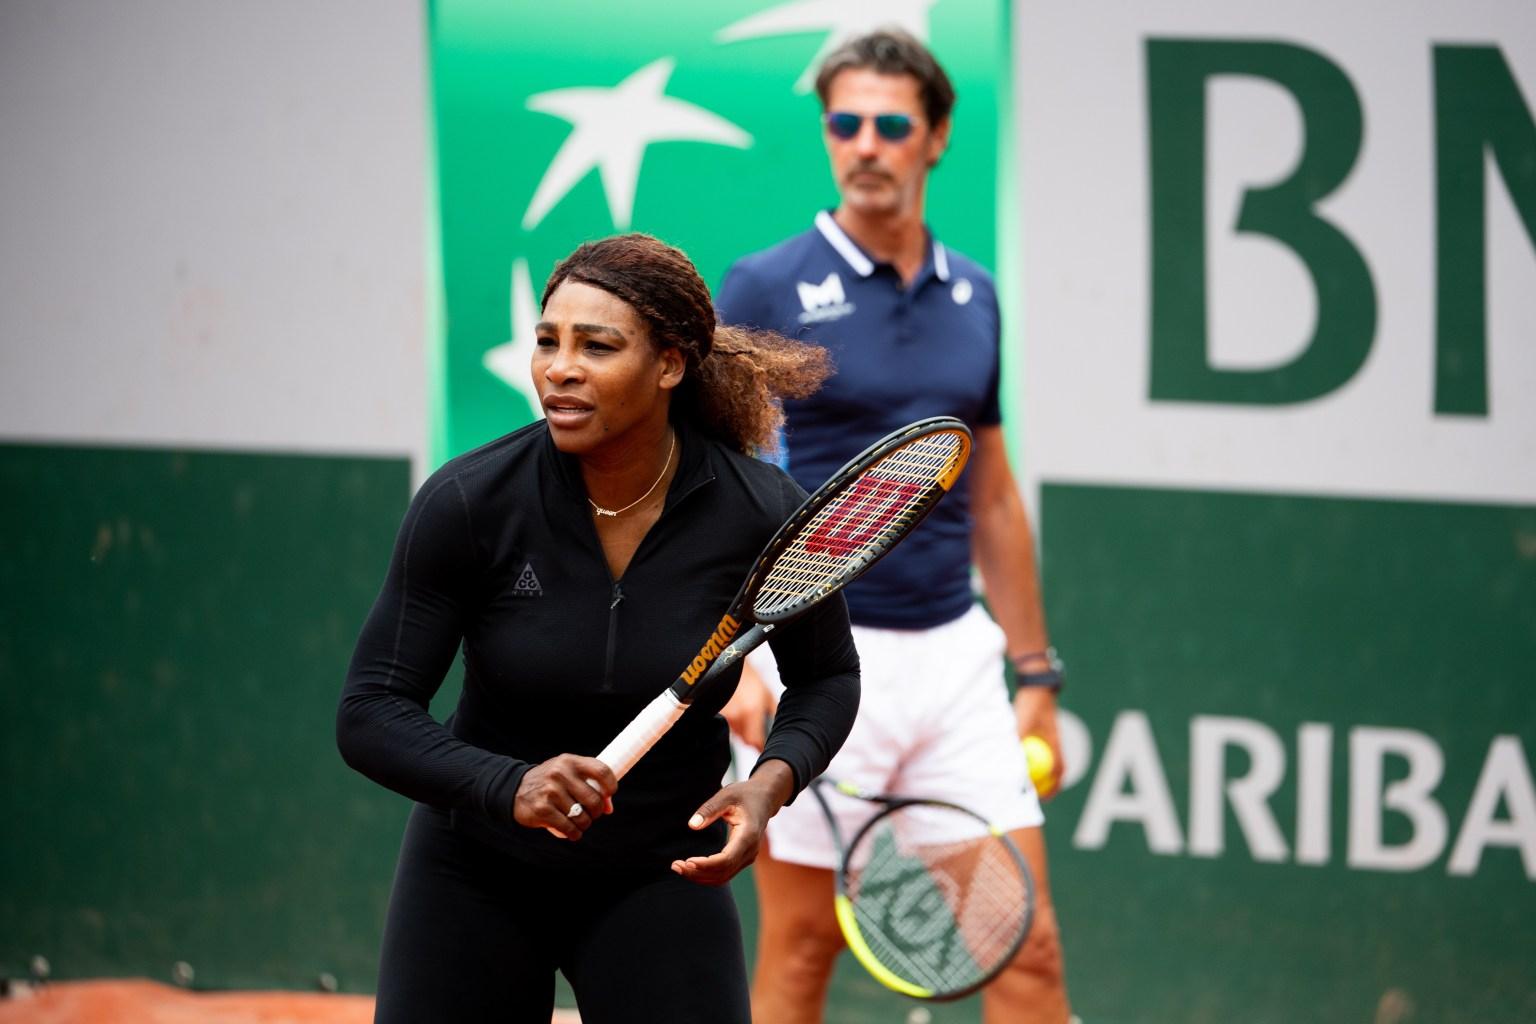 Patrick Mouratoglou on Dominant New Tennis Talent & Coaching Serena Williams